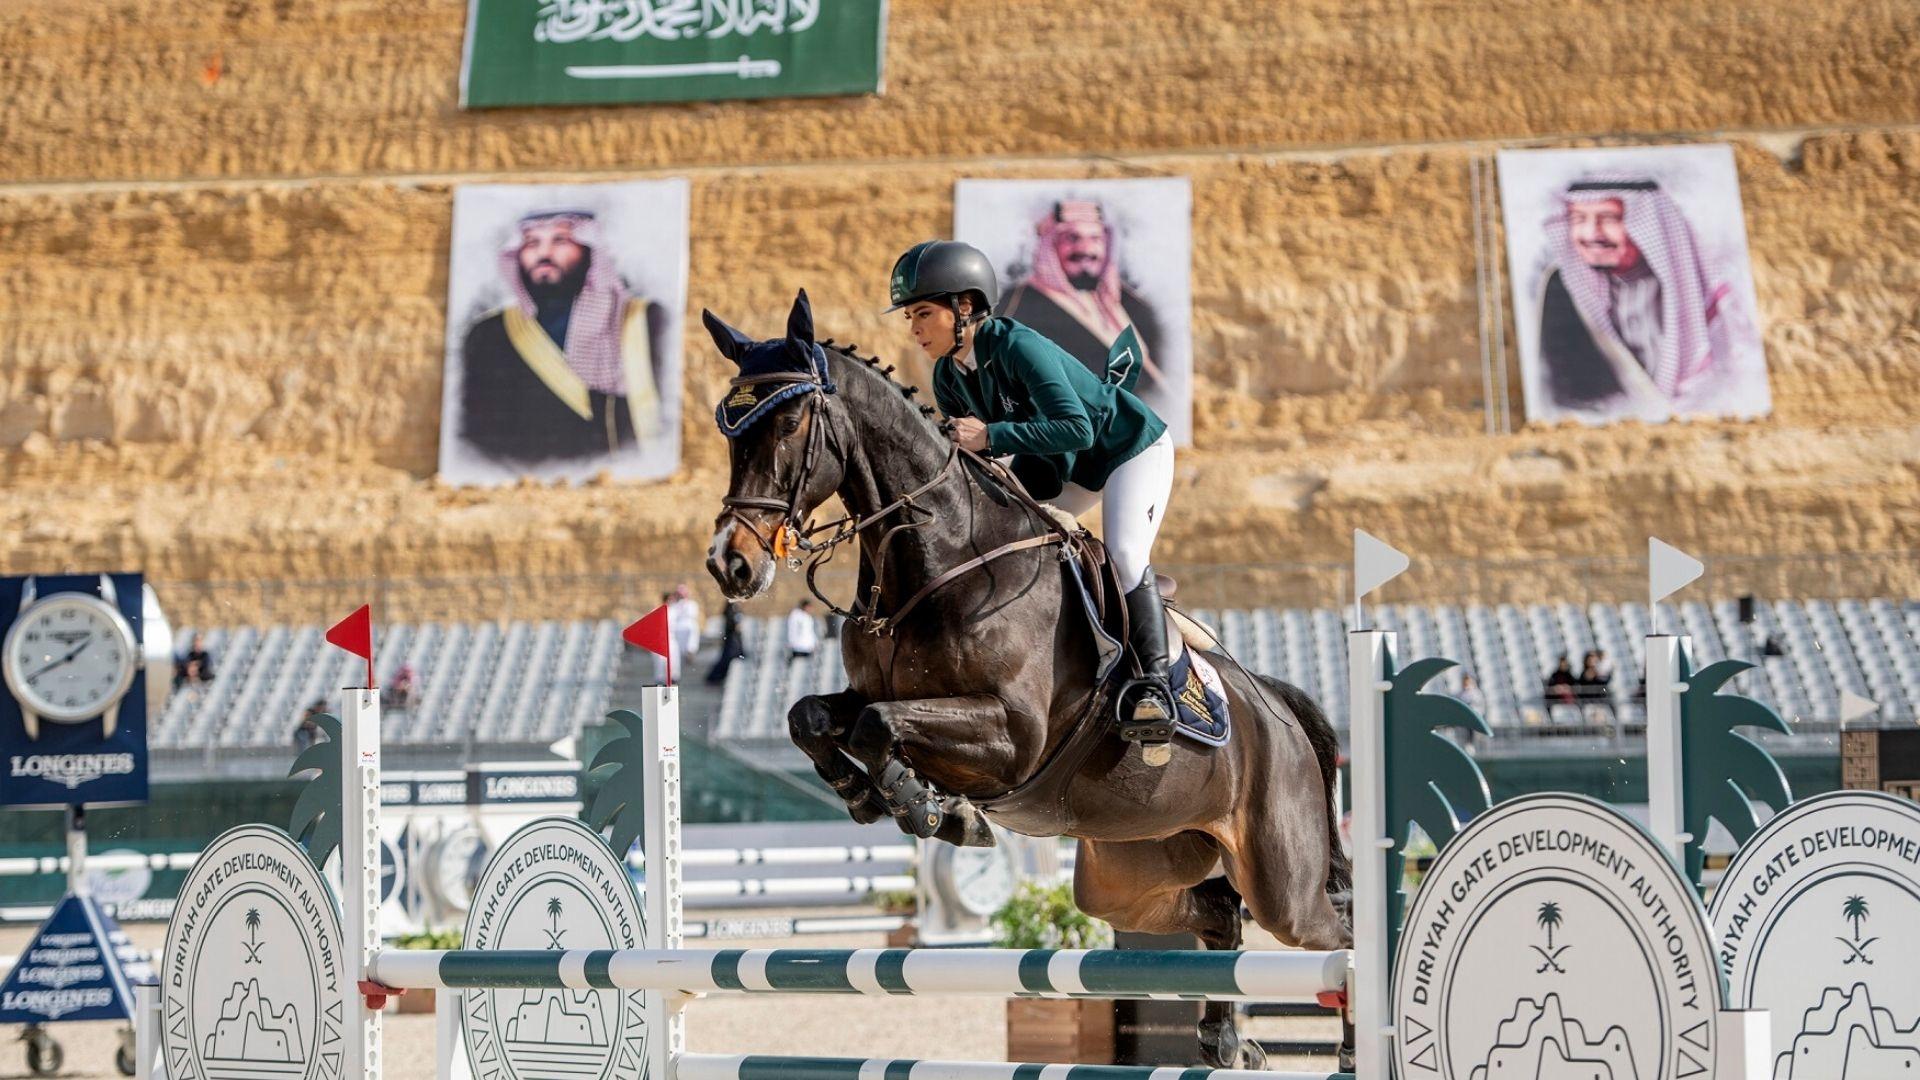 Saudi Female Horse Riders Make History Competing Alongside Men In Diriyah Equestrian Festival